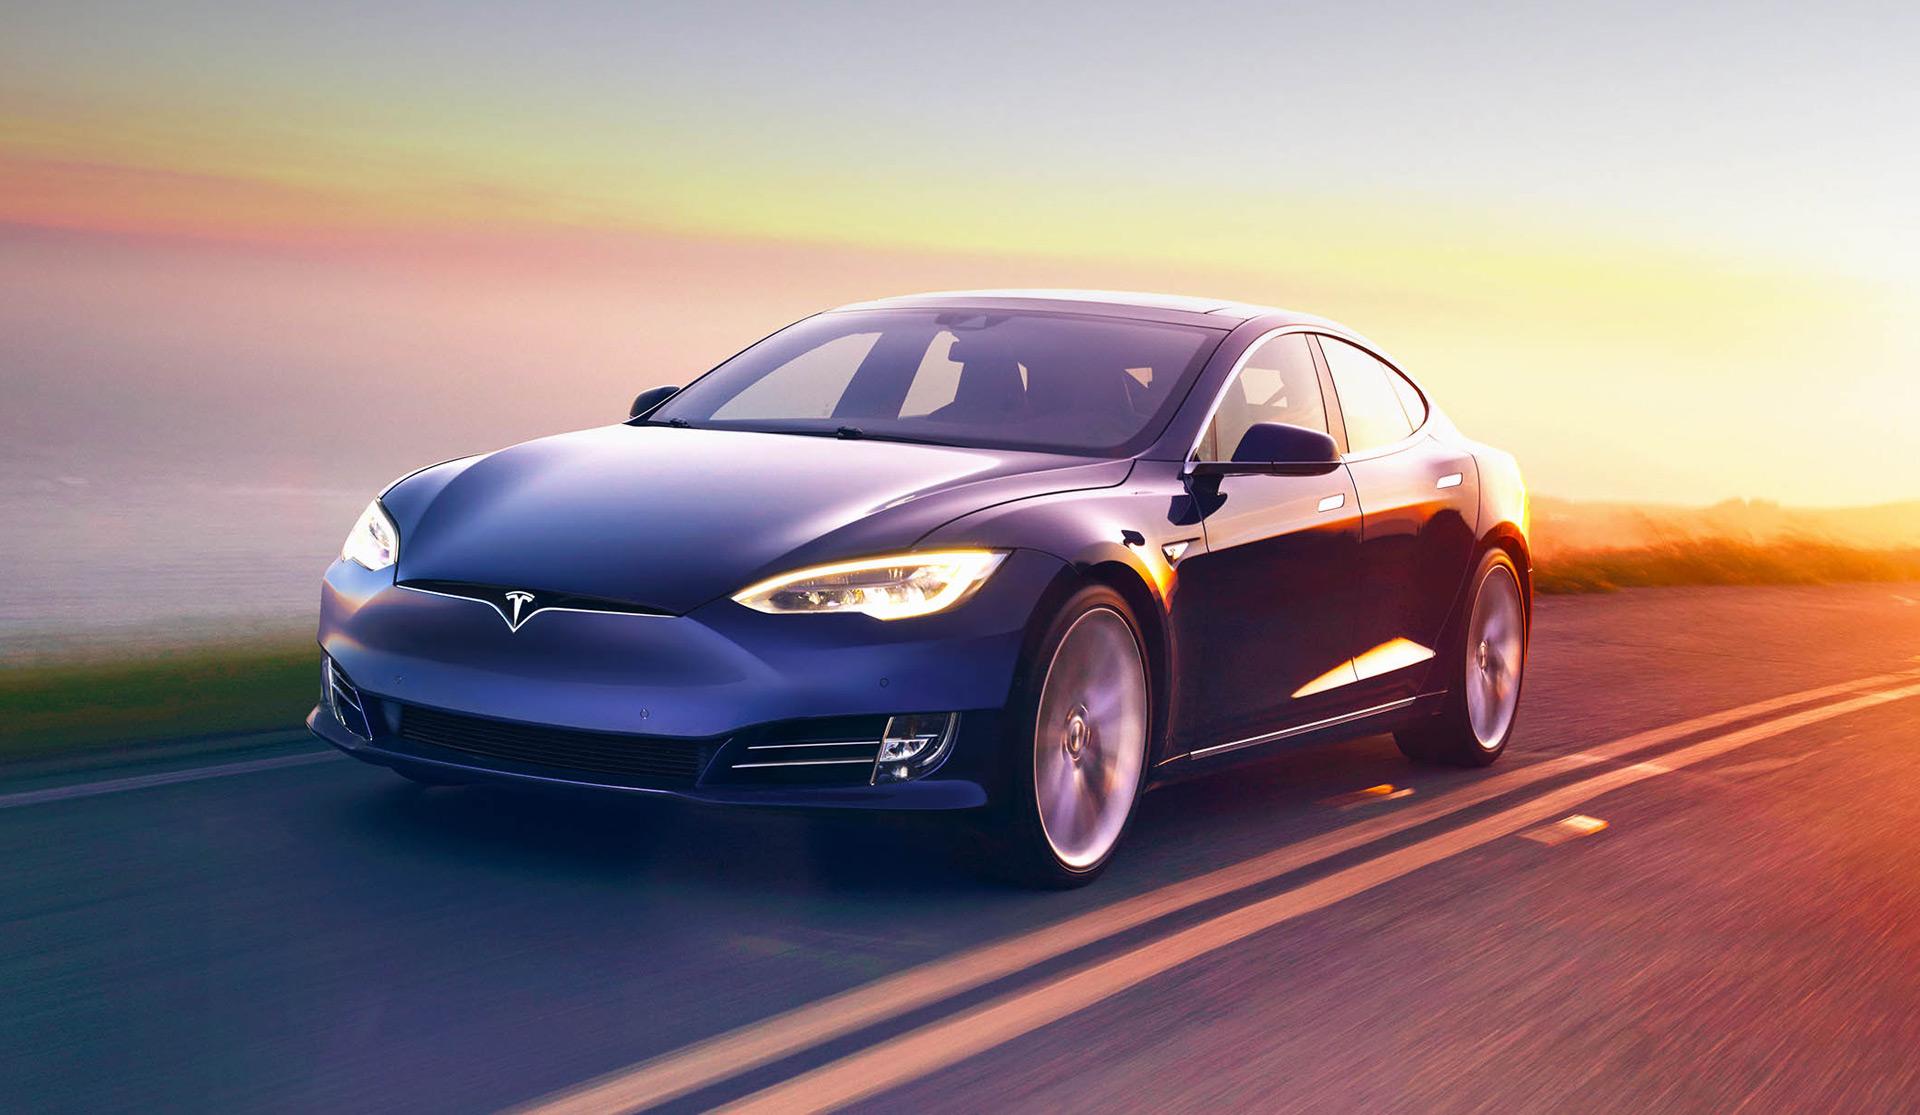 Why NASA thinks the Tesla Autopilot is a bad idea